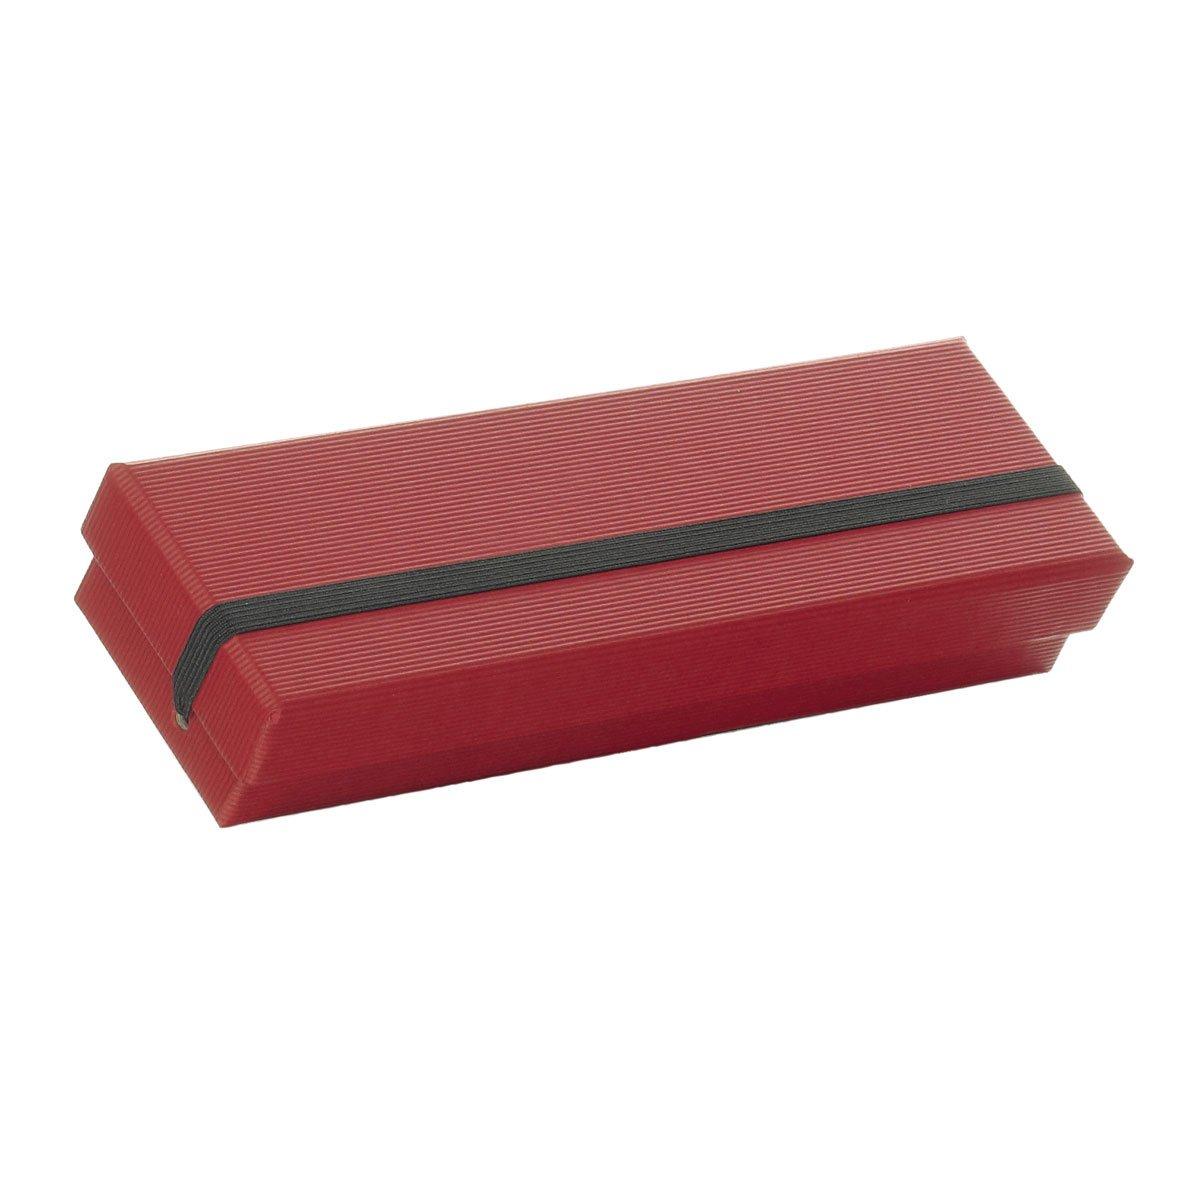 Rössler Papier - - S.O.H.O. Rot - Stiftebox m. Gummizug - 200x55x30 - Liefermenge  4 Stück B07CX7R8MQ | Attraktiv Und Langlebig